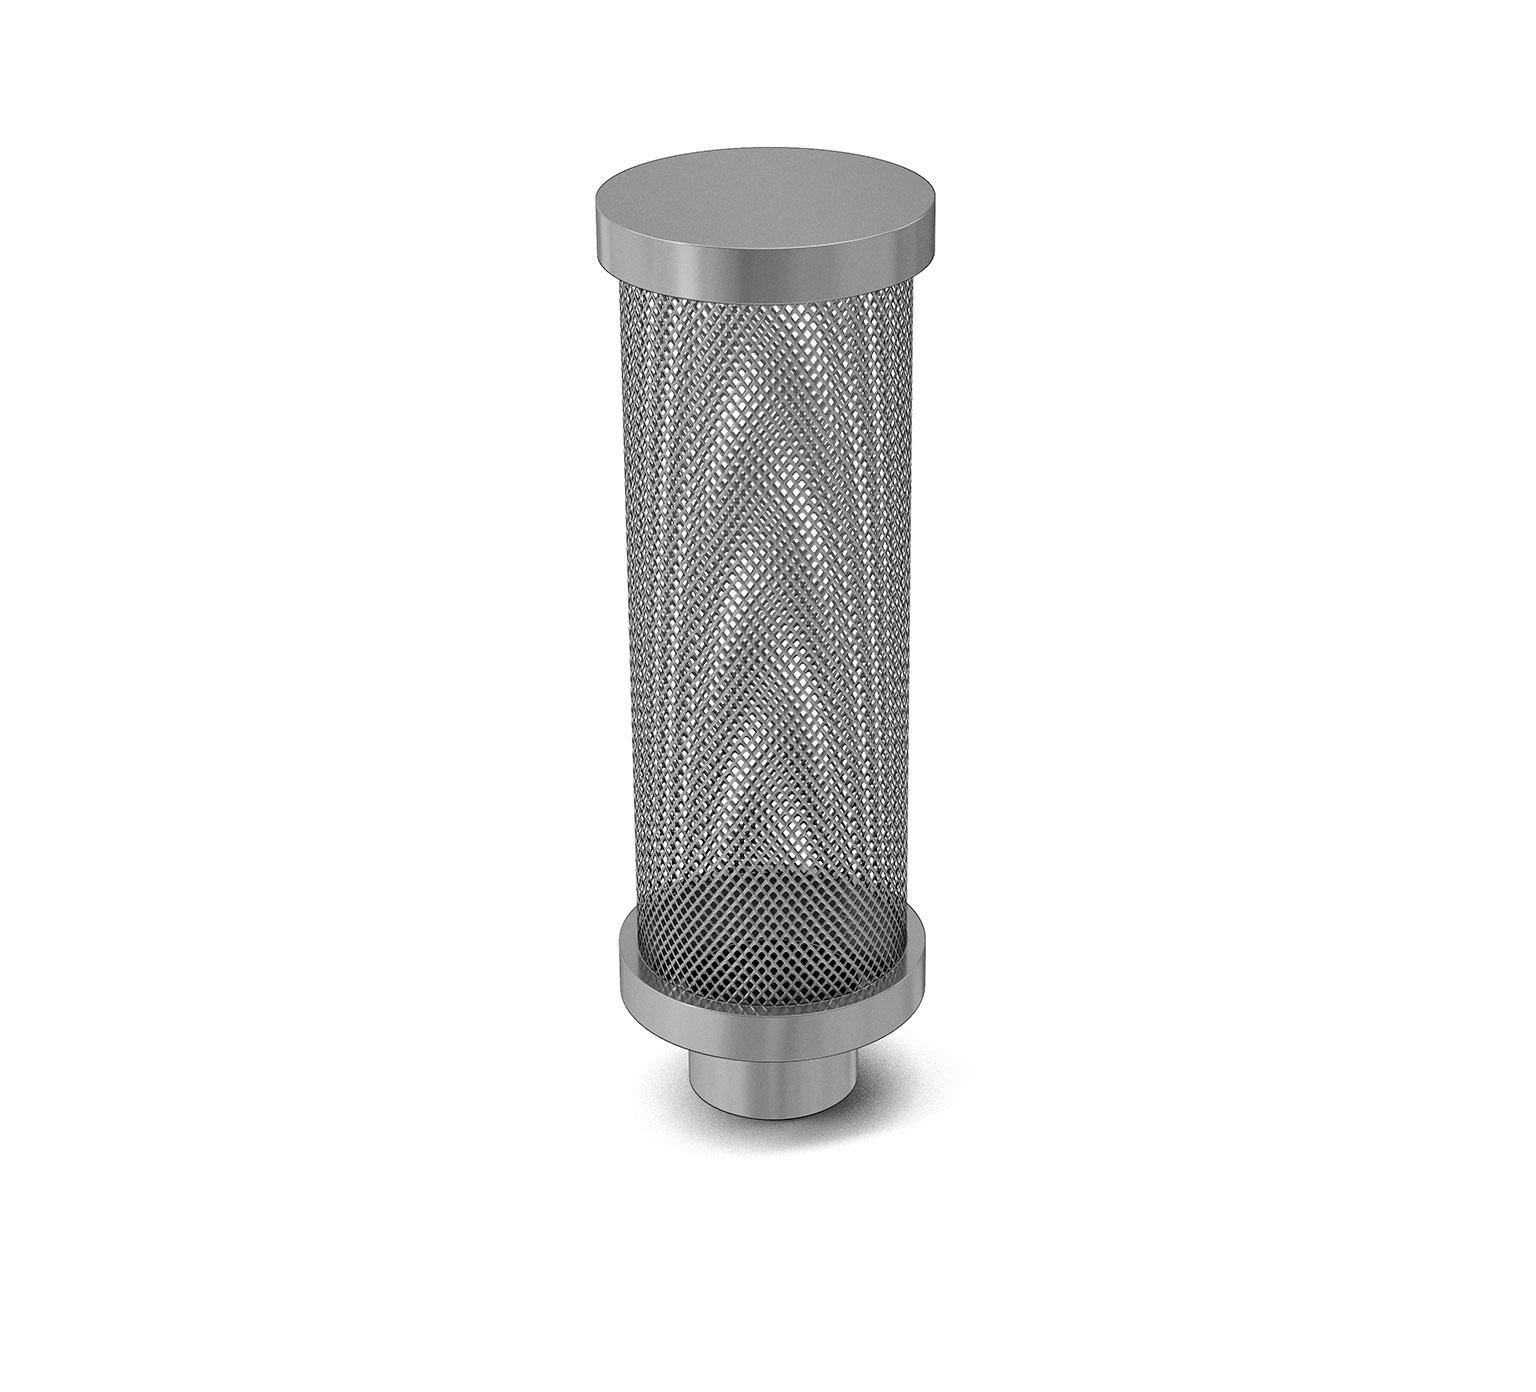 Buy Tires Online >> TennantTrue Water Filter Solution, 80 Mesh | PN: 398770